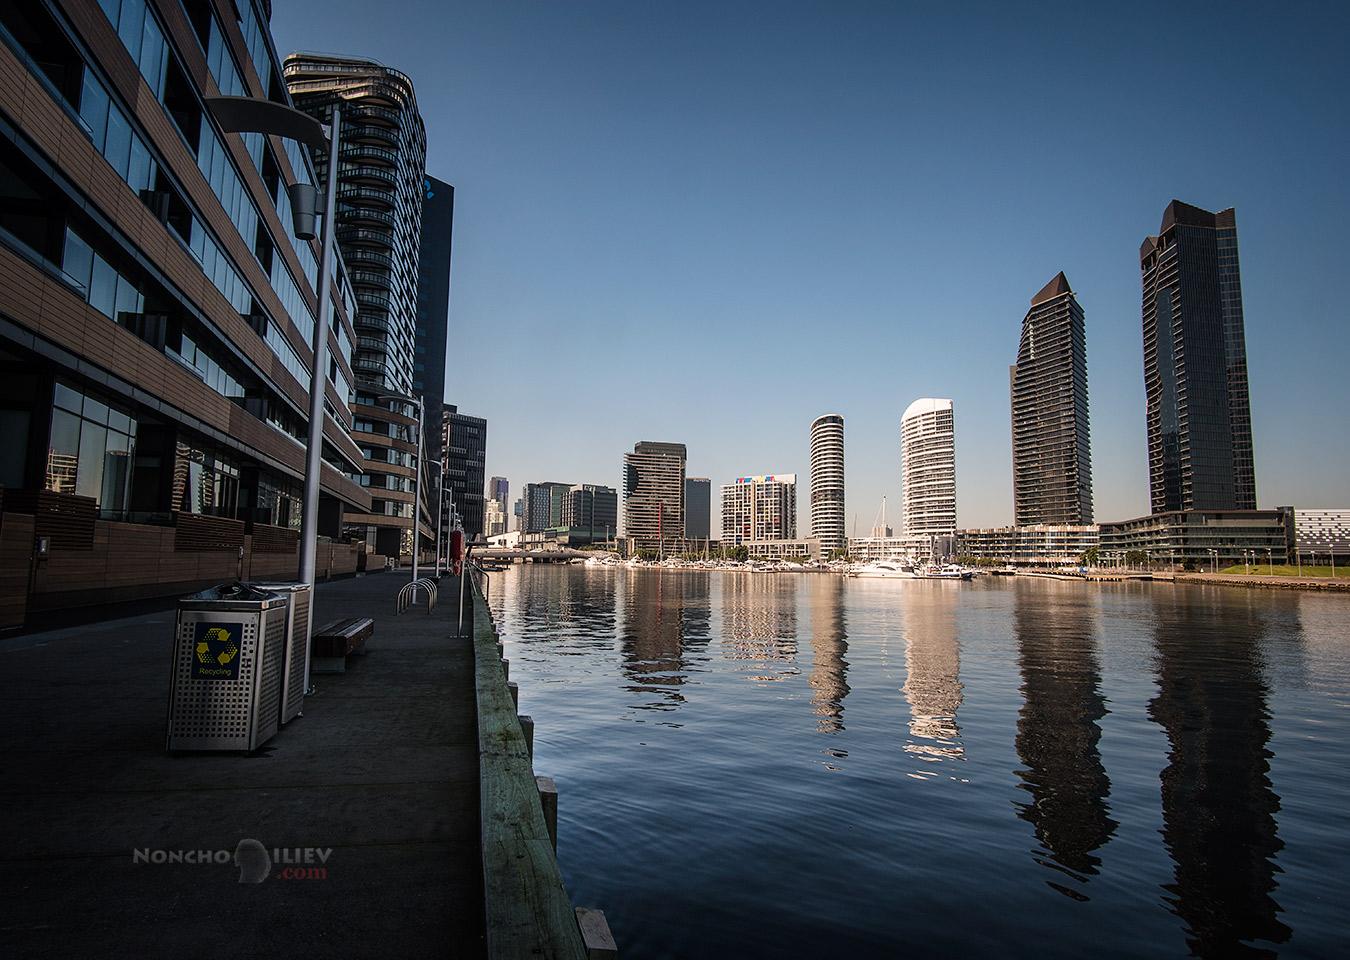 Melbourne docks